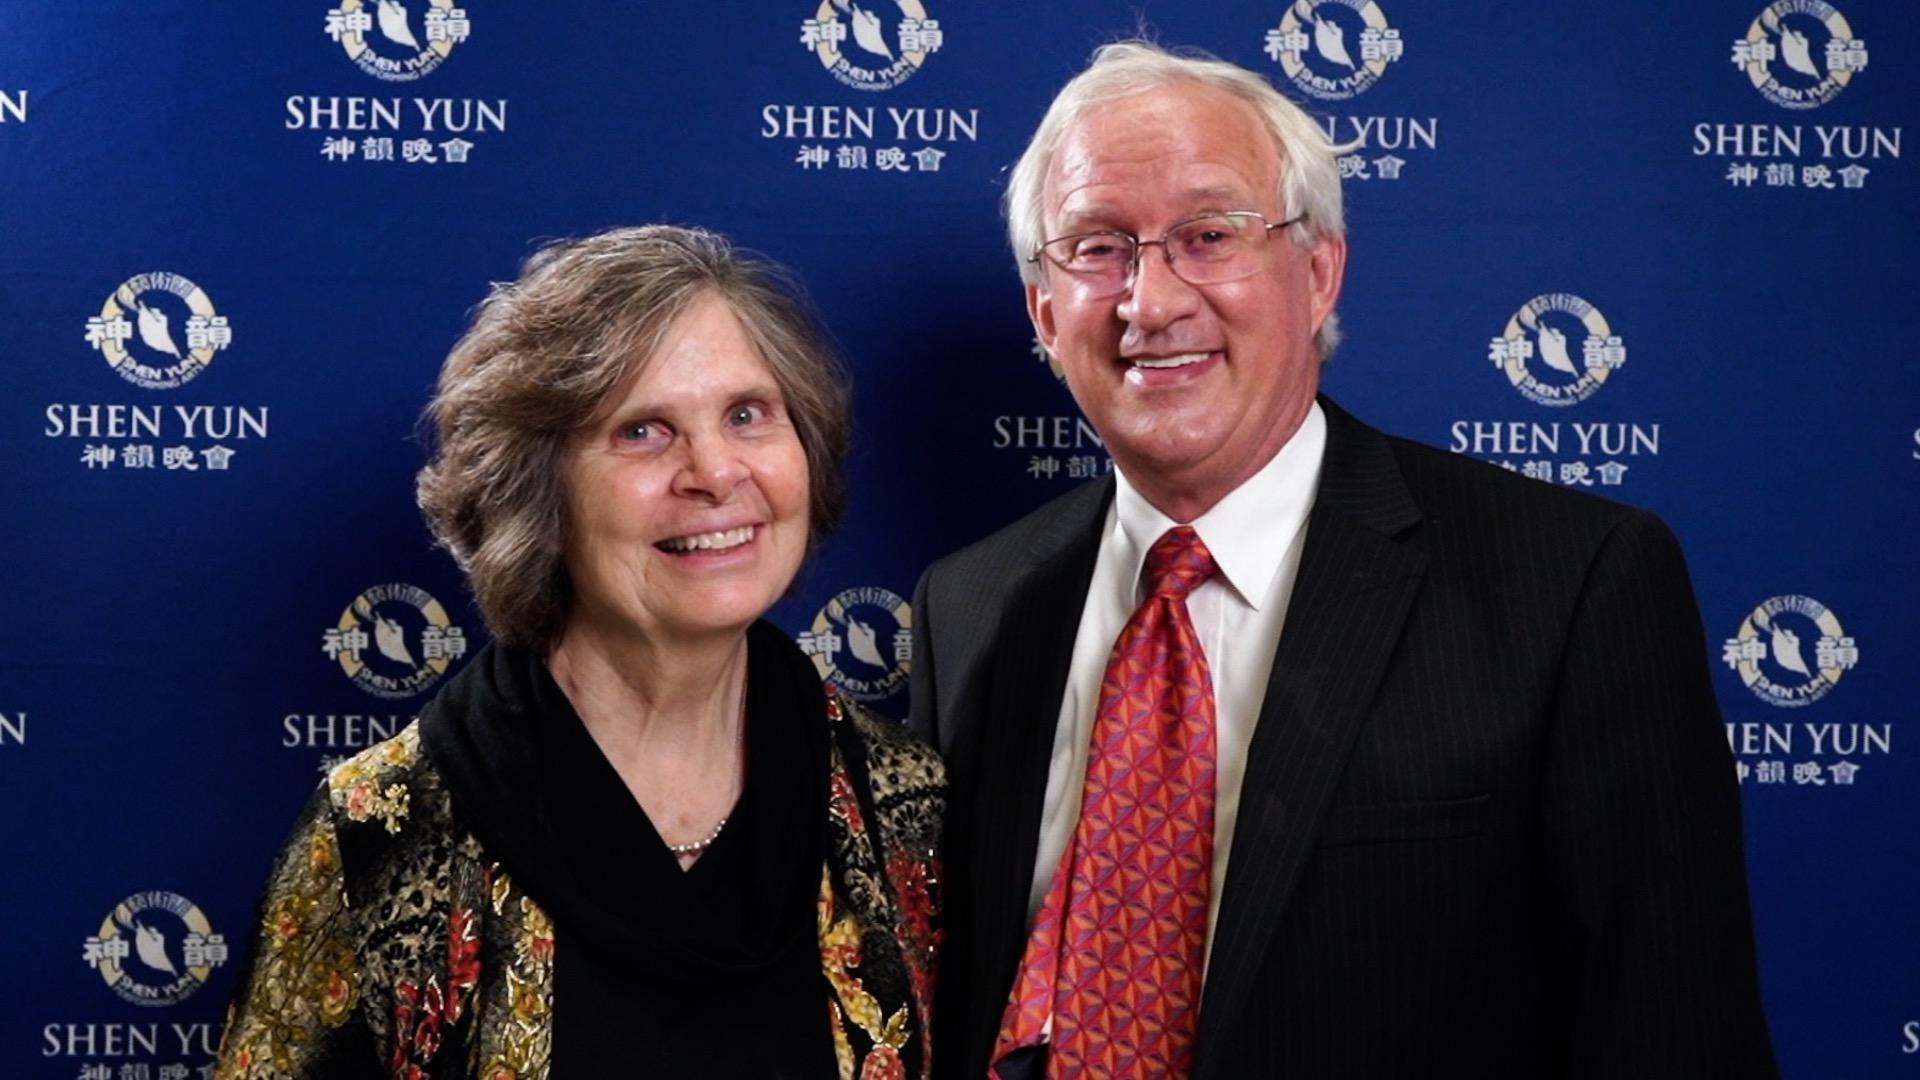 College Professor Leaves Shen Yun Performance Feeling Lighter